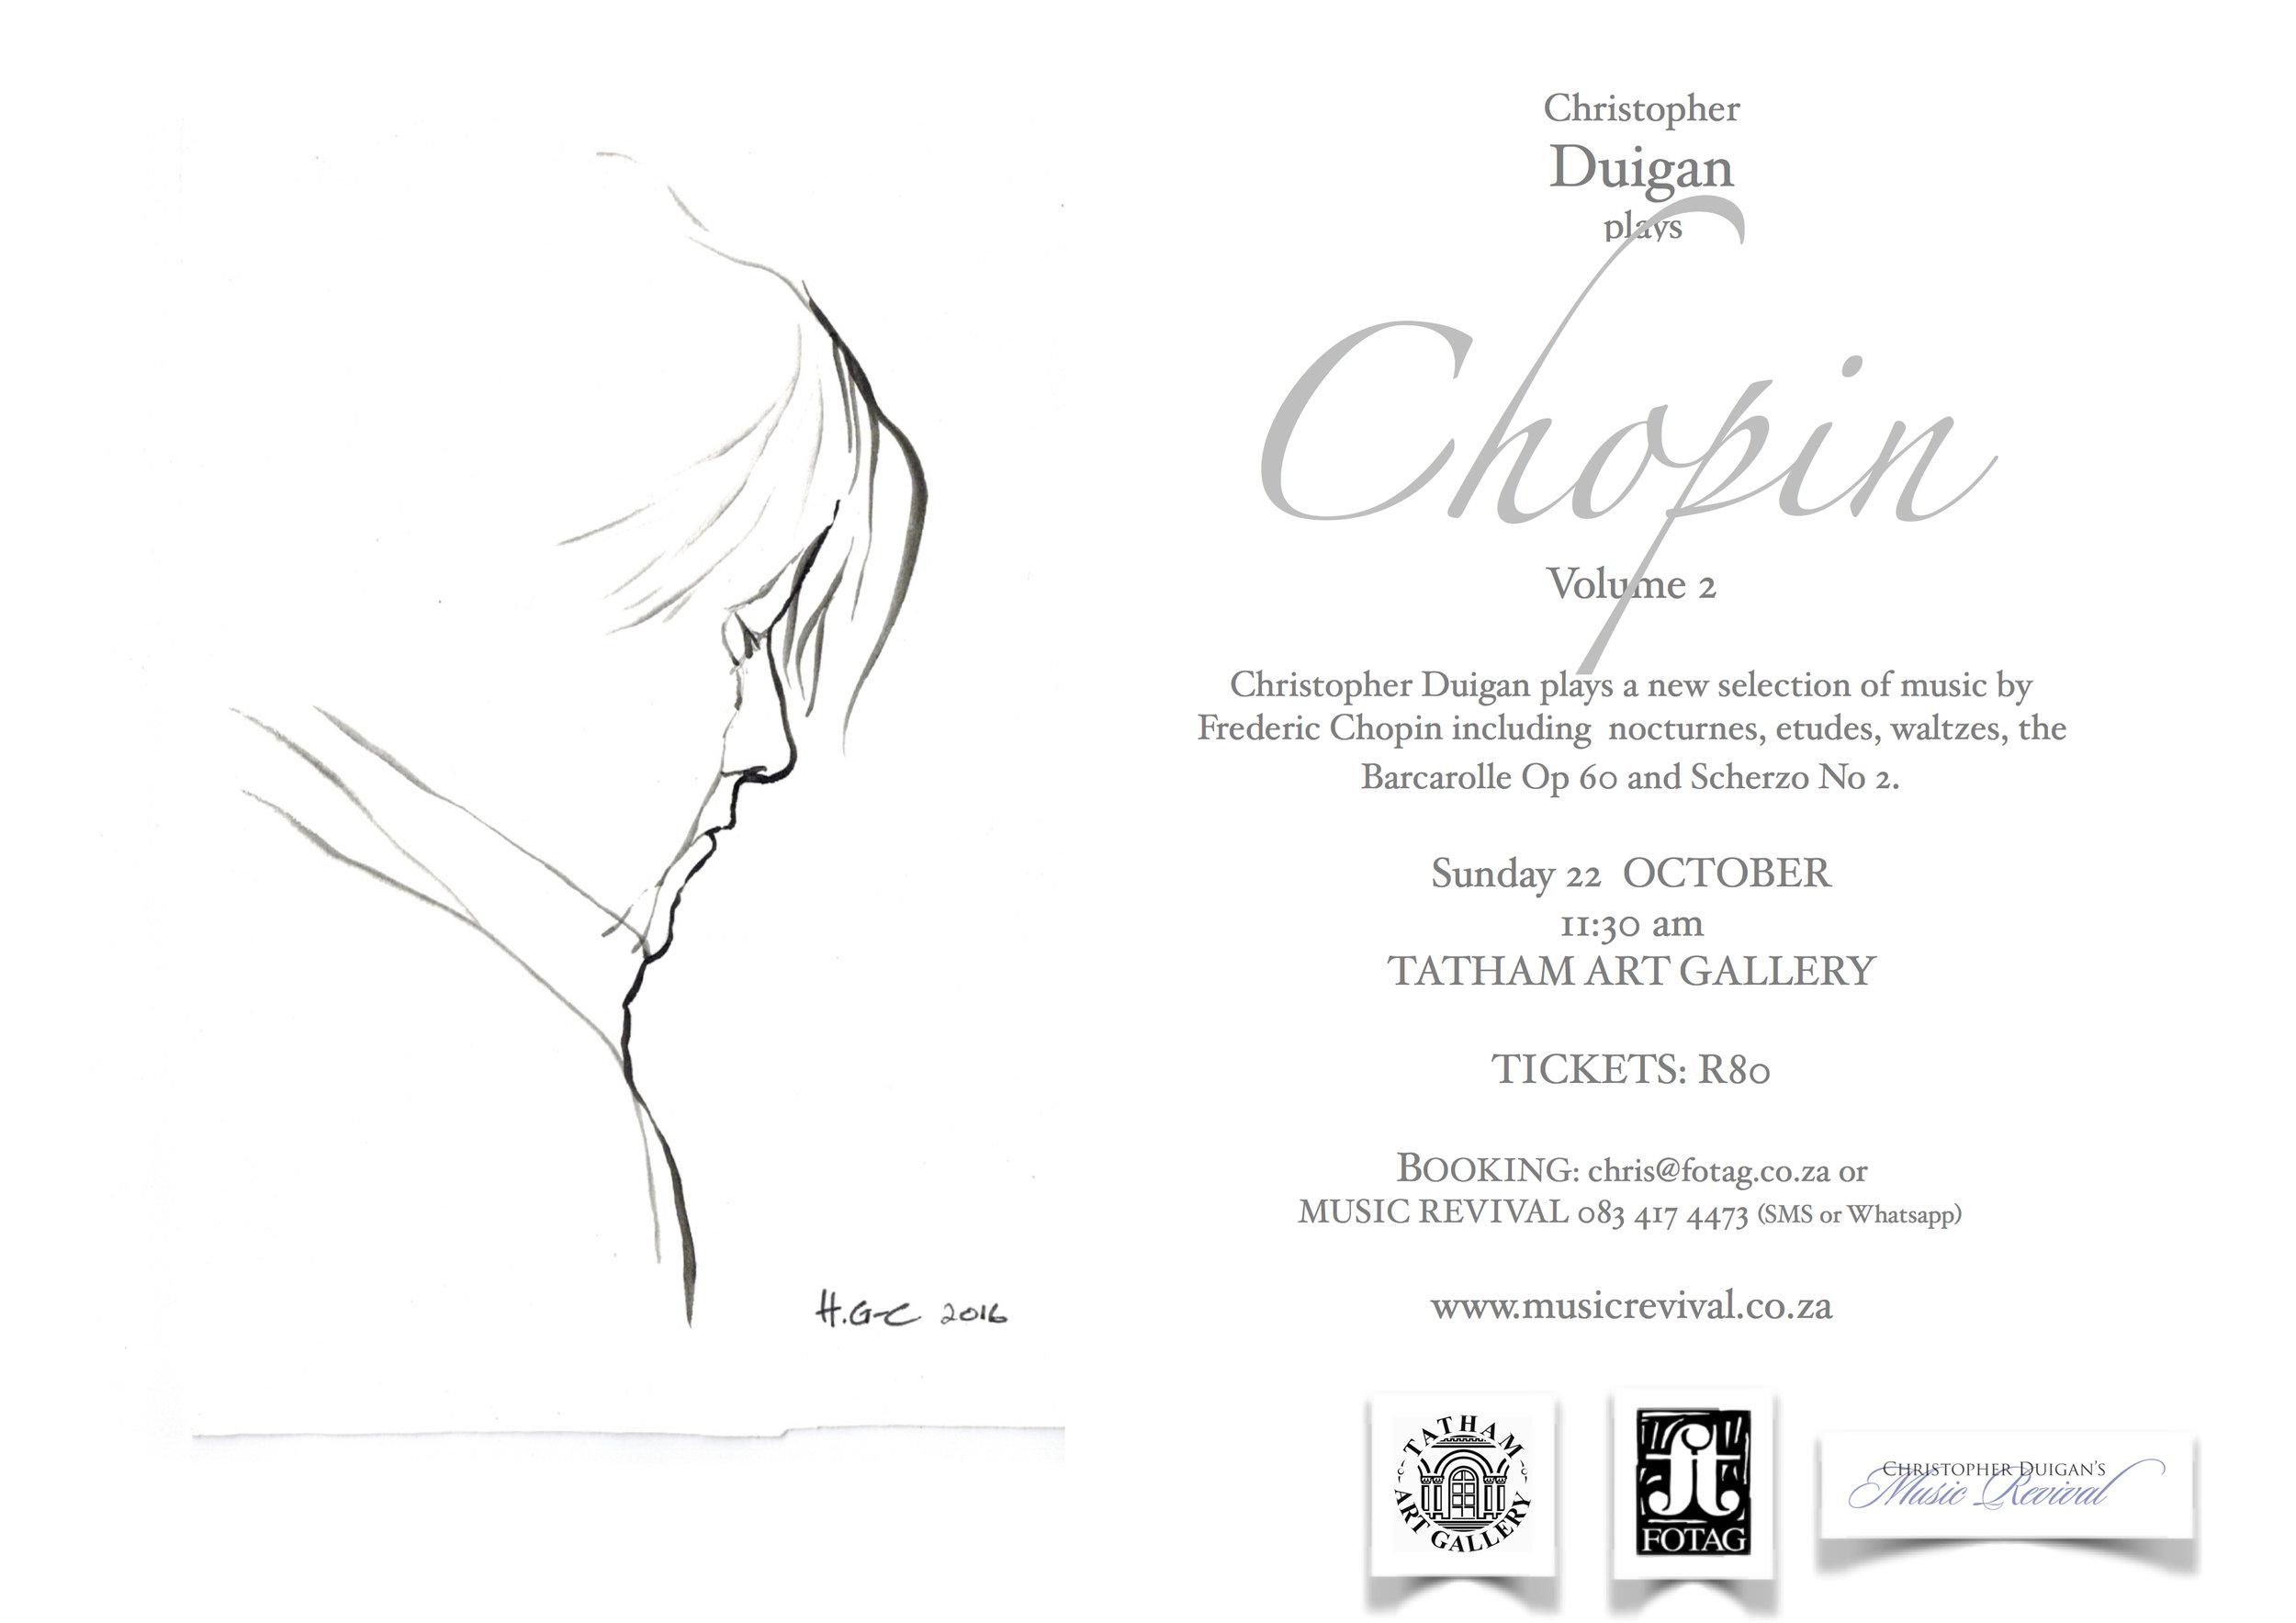 CHOPIN OCT 17  TAG  copy 2.jpg